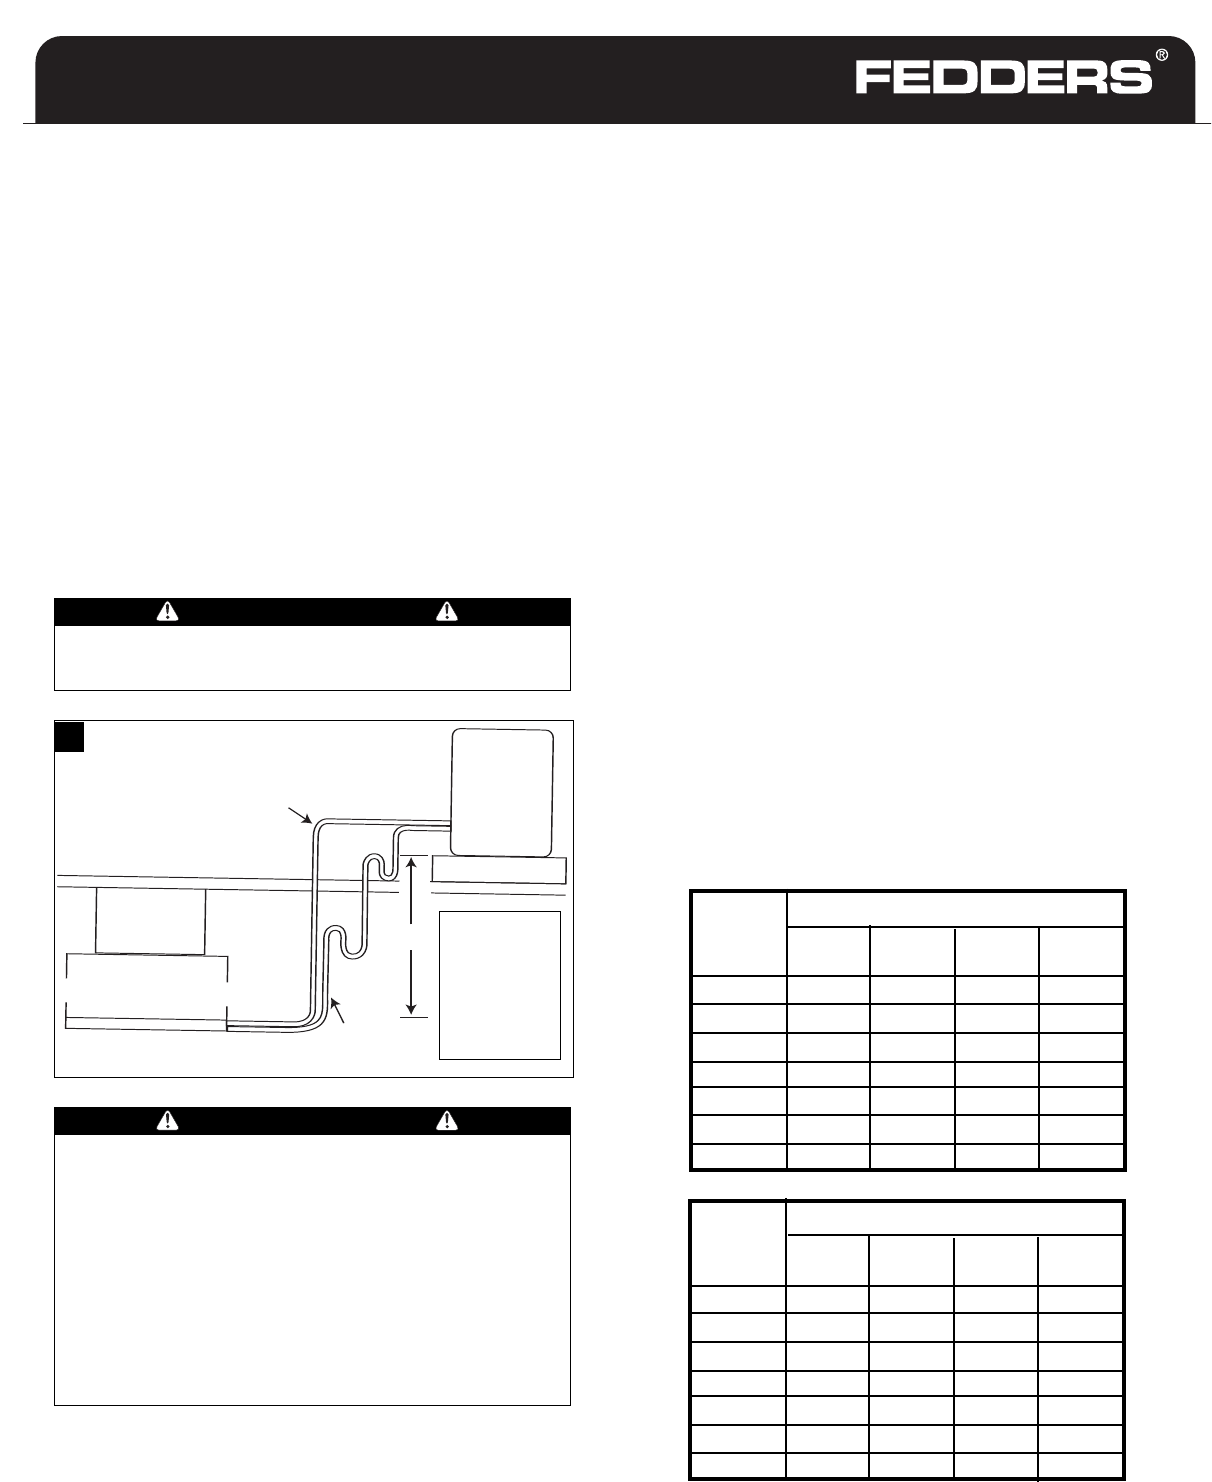 [DVZP_7254]   Fedders Split System Air Conditioner CONNECT REFRIGERANT PIPING, Precautions | Fedders Air Handler Wiring Diagram |  | Manuals